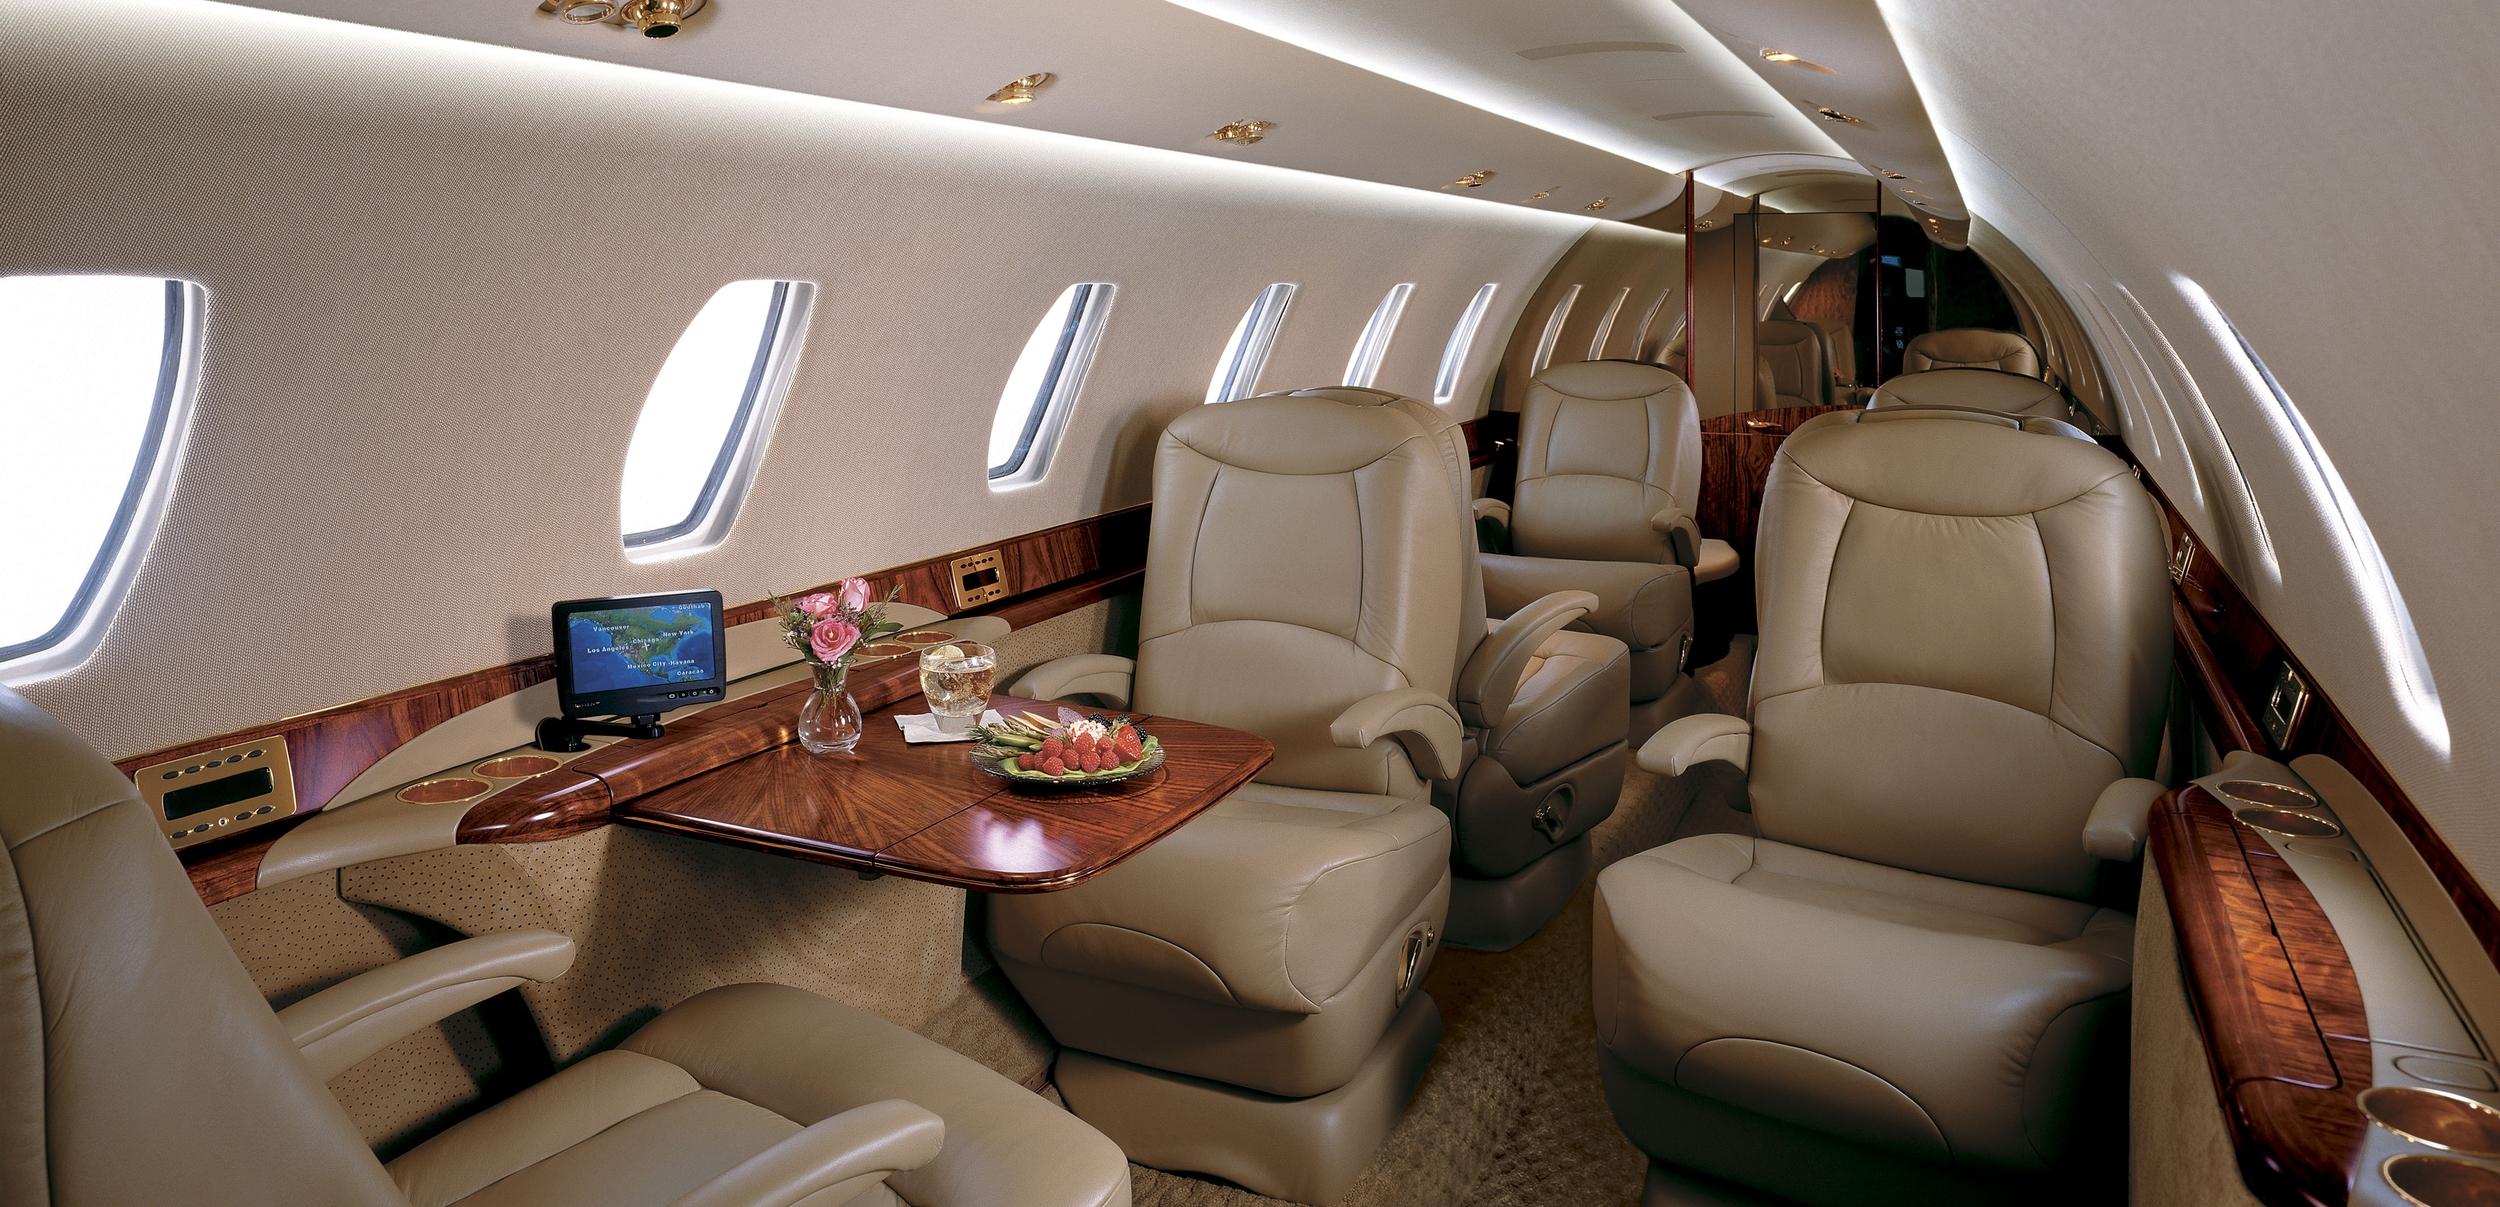 vip aircraft.jpg